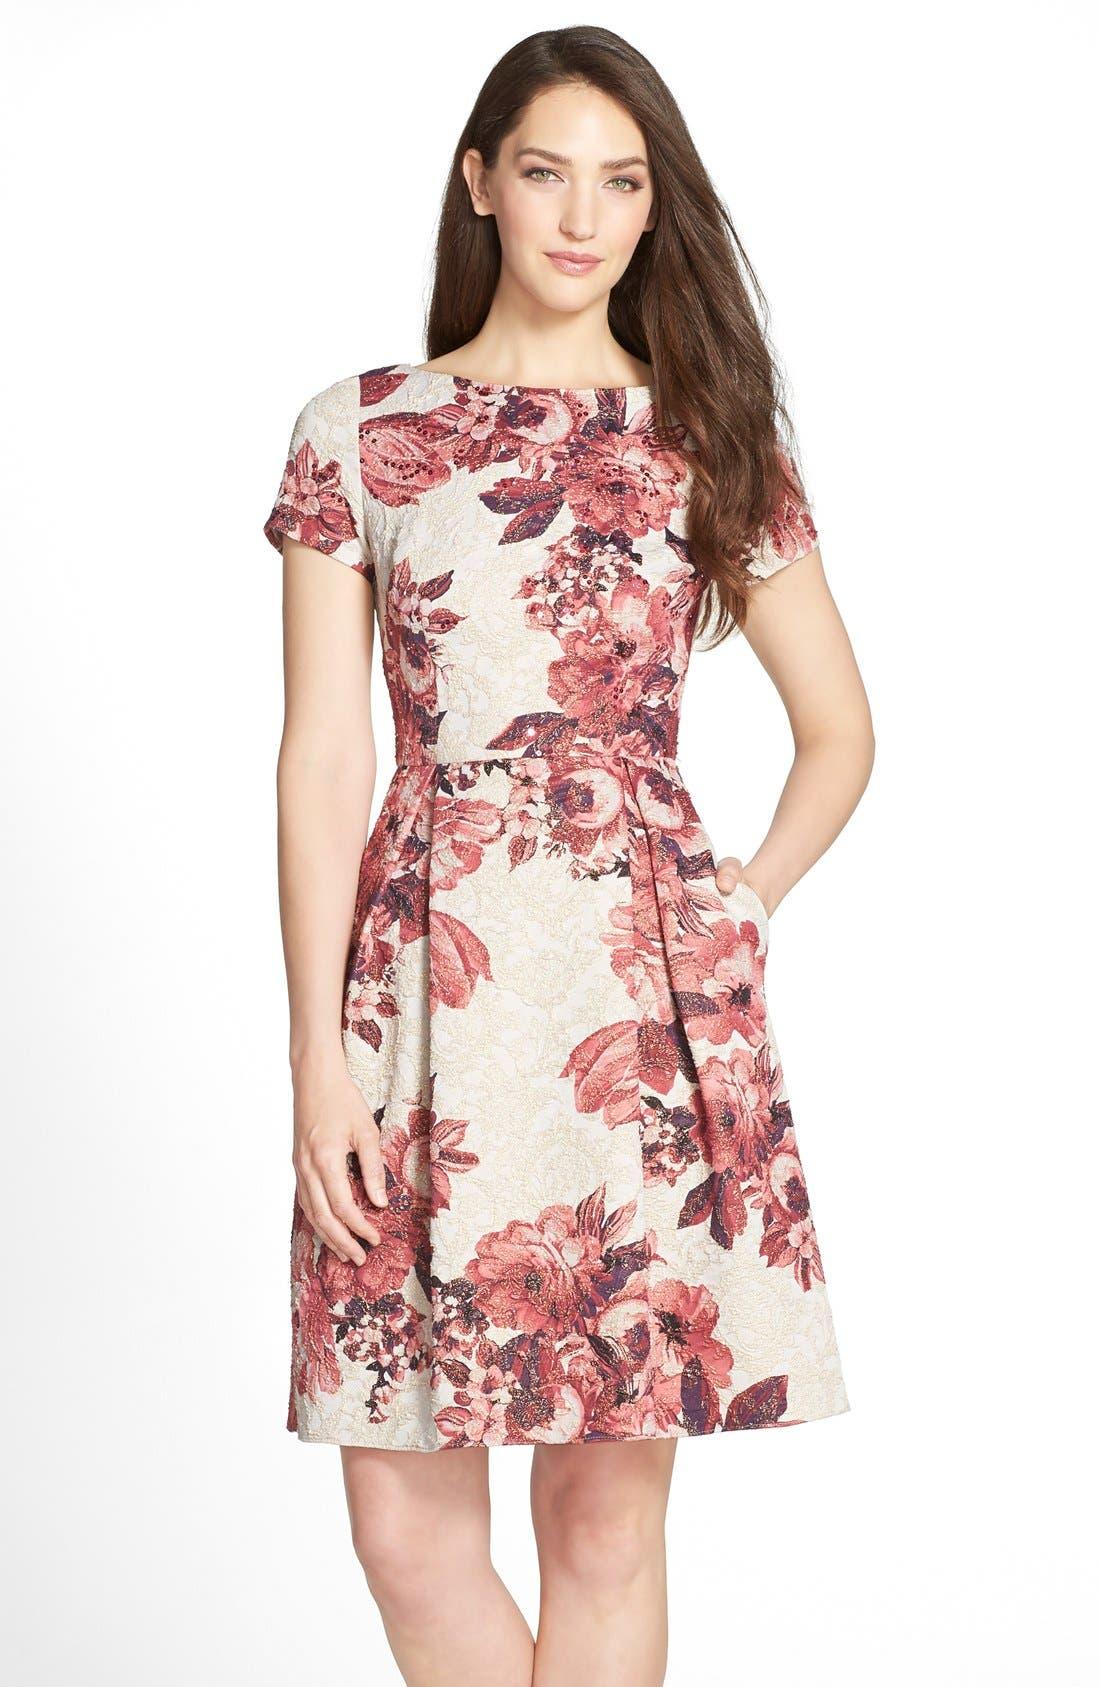 Alternate Image 1 Selected - Adrianna Papell Floral Matelassé Fit & Flare Dress (Regular & Petite)